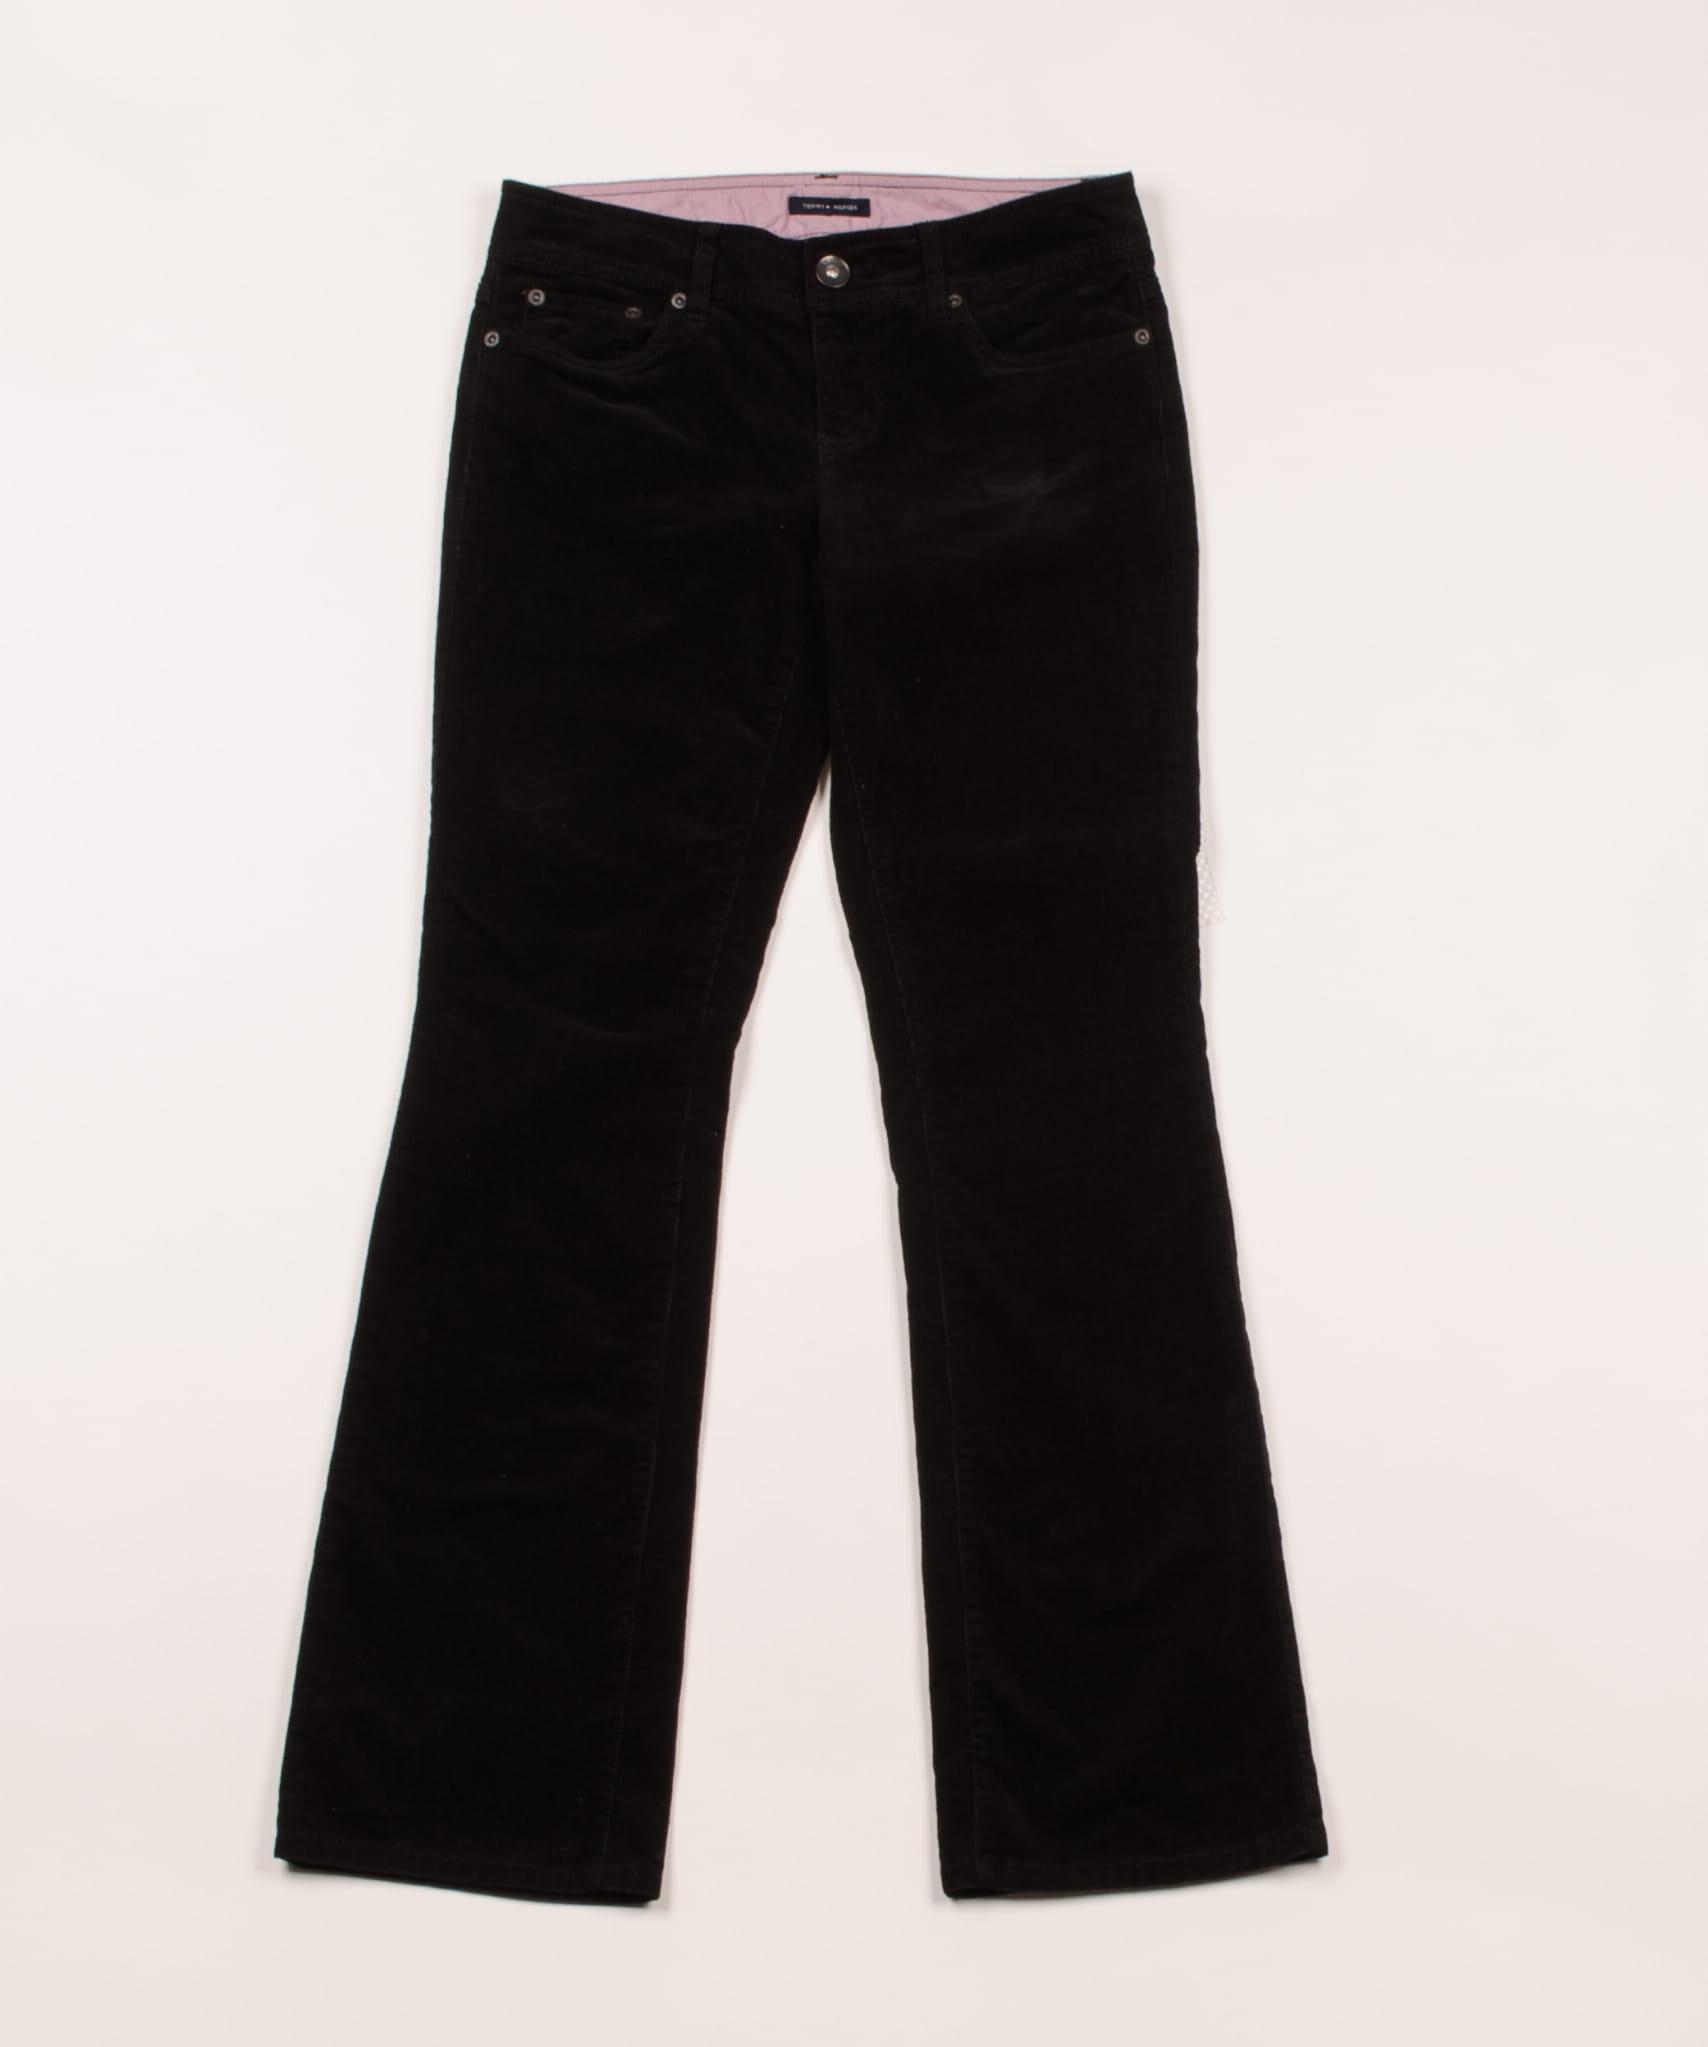 21289 Tommy Hilfiger Spodnie Damskie L